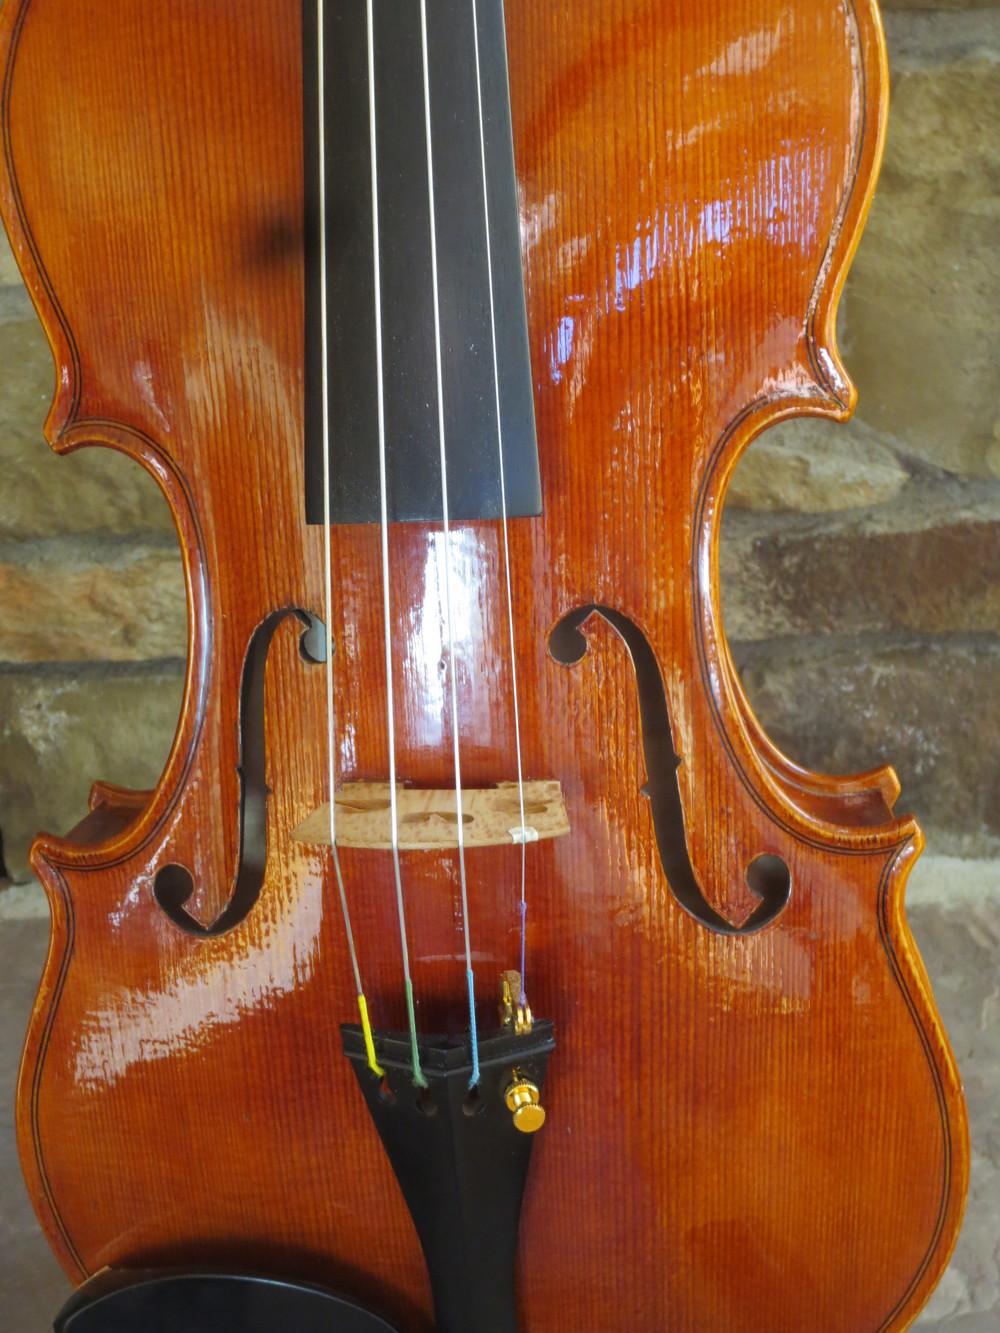 olga and Miro's violin 001.JPG